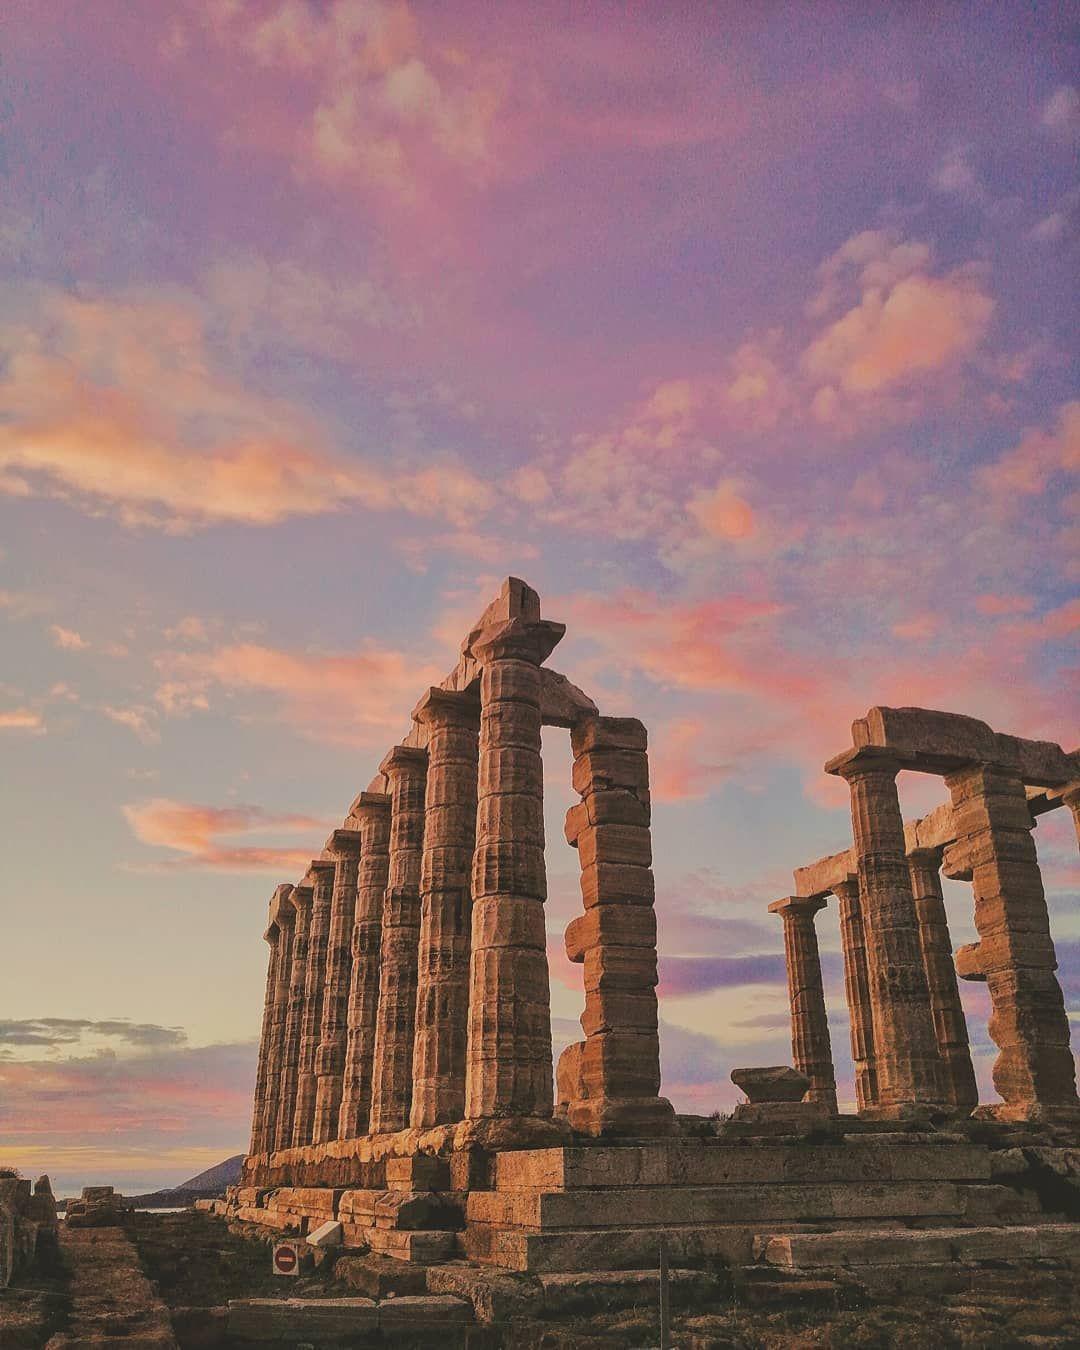 Poseidon Temple Capesounion Ictinus Ancient Greece Archeology Myths Legends Ancient Greek Architecture Ancient Greece Architecture Ancient Greece Art